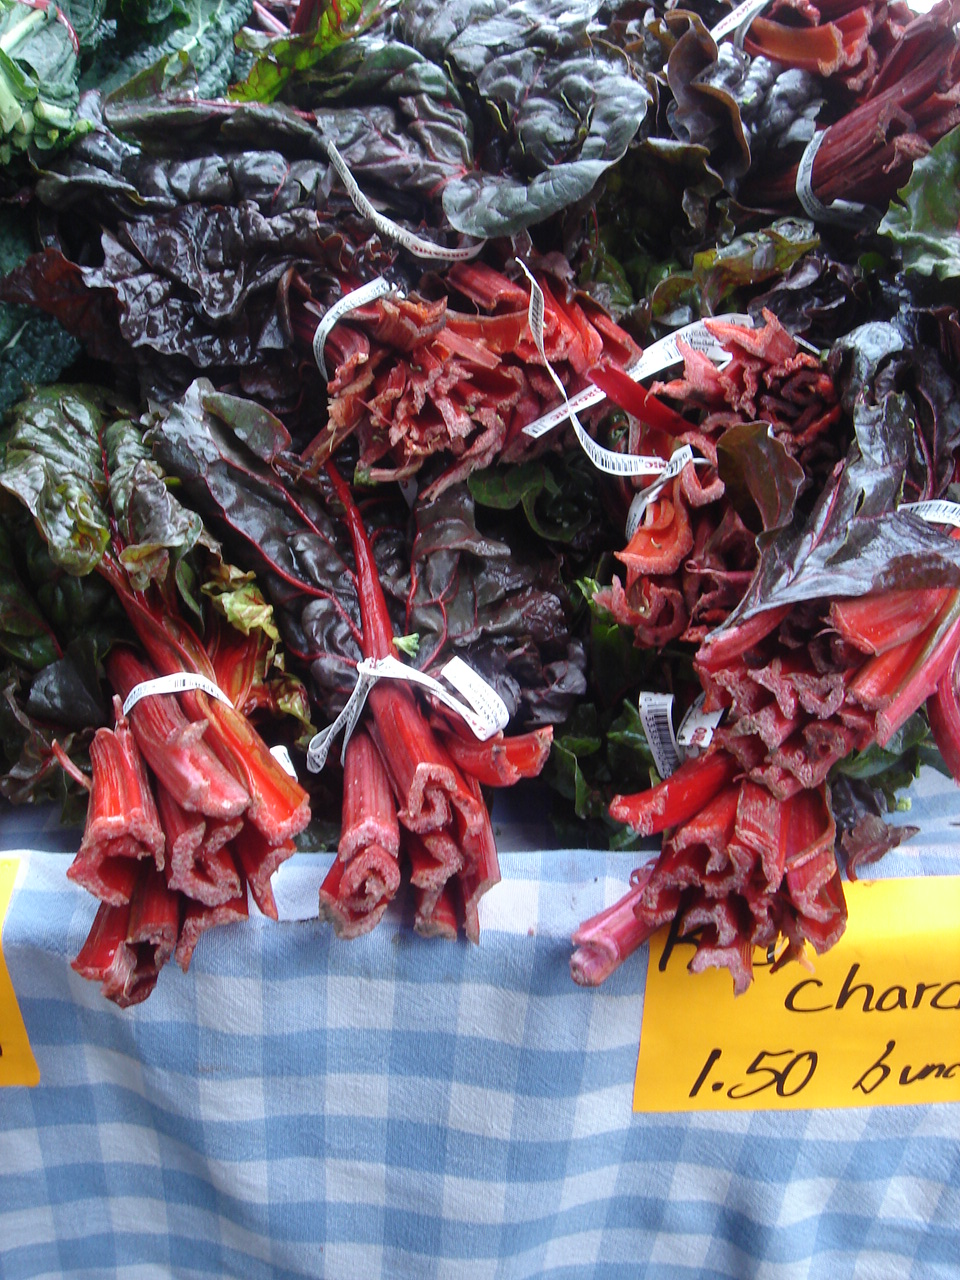 Temescal Farmer's Market